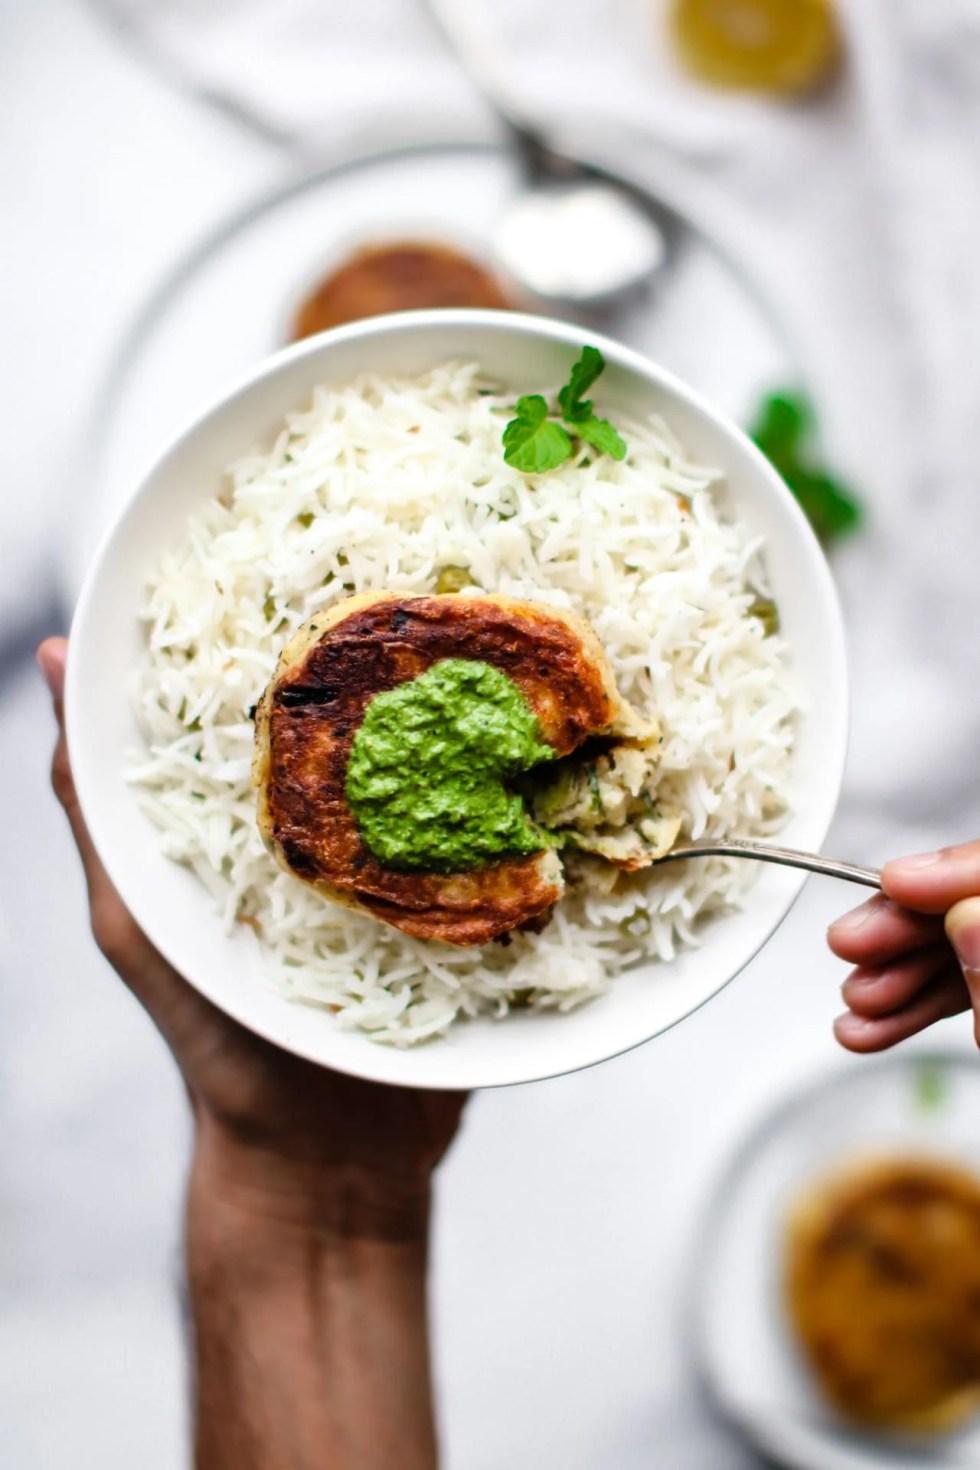 Aloo Ki Tikki with rice and chutney